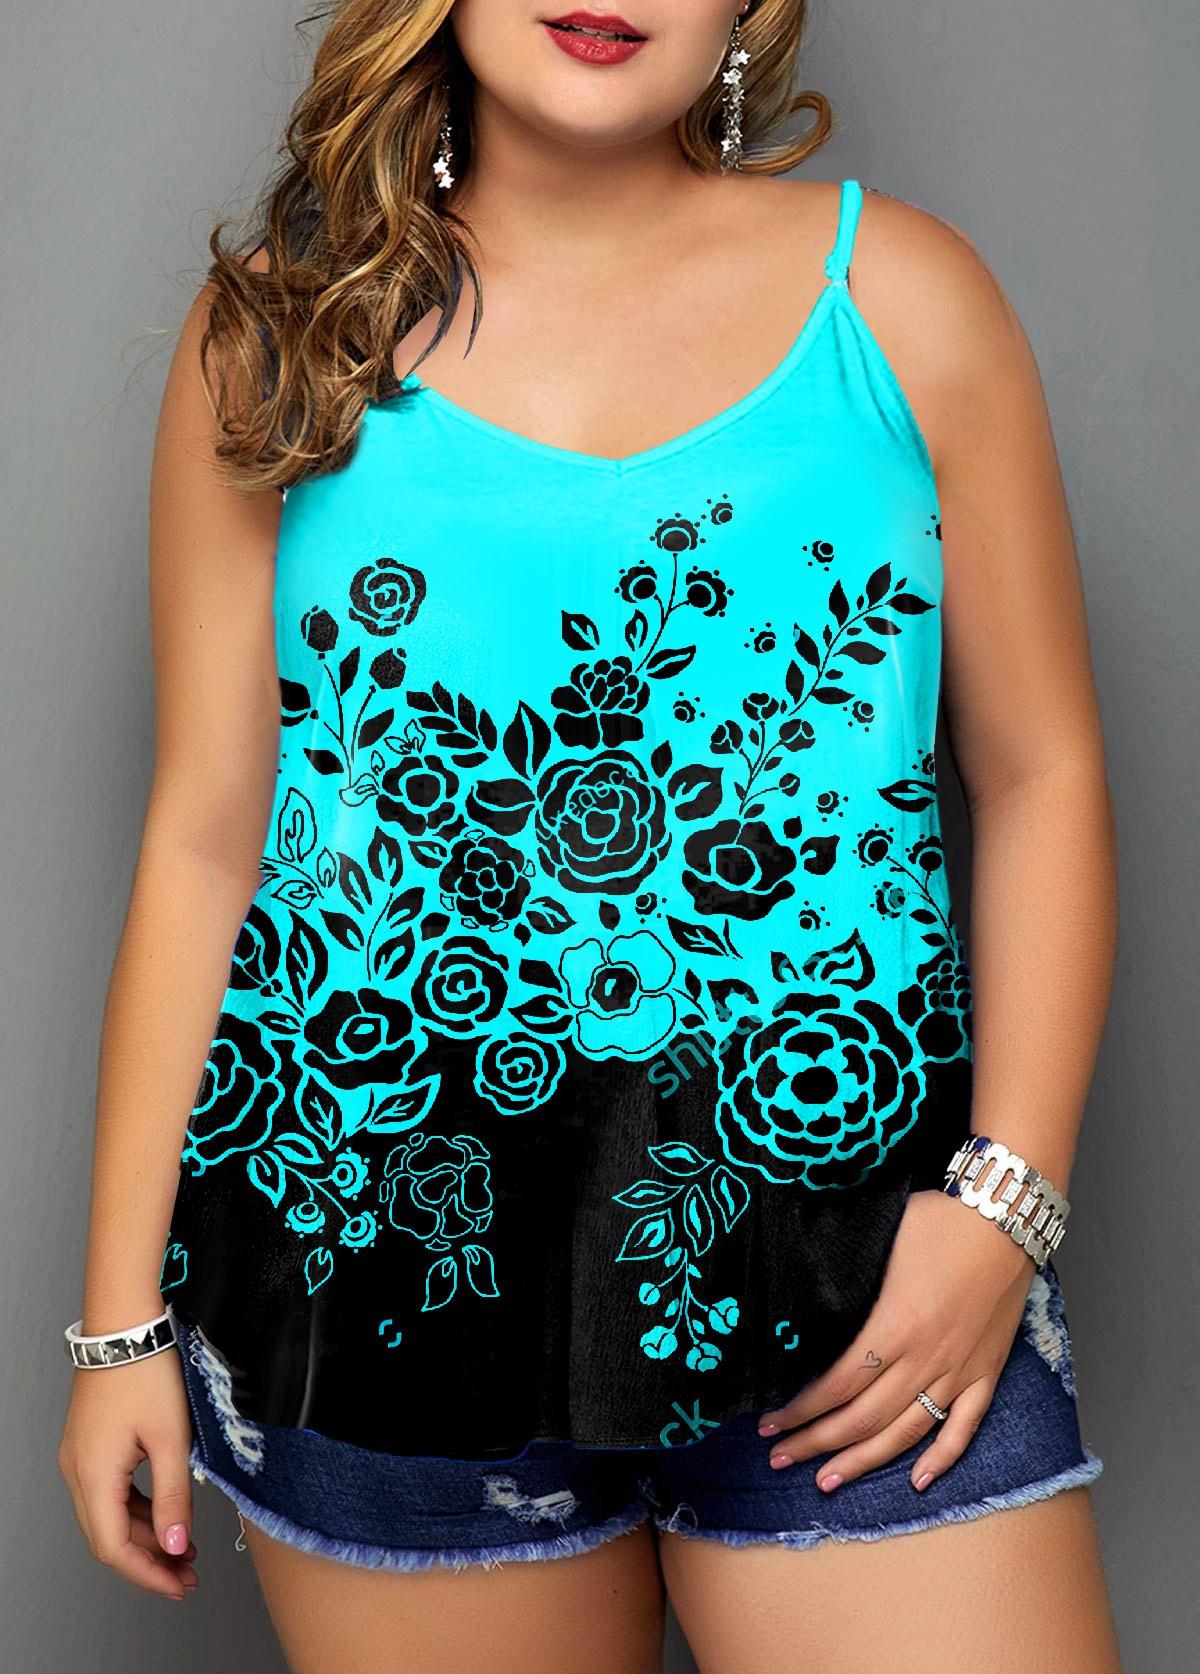 Floral Print Plus Size Ombre Camisole Top